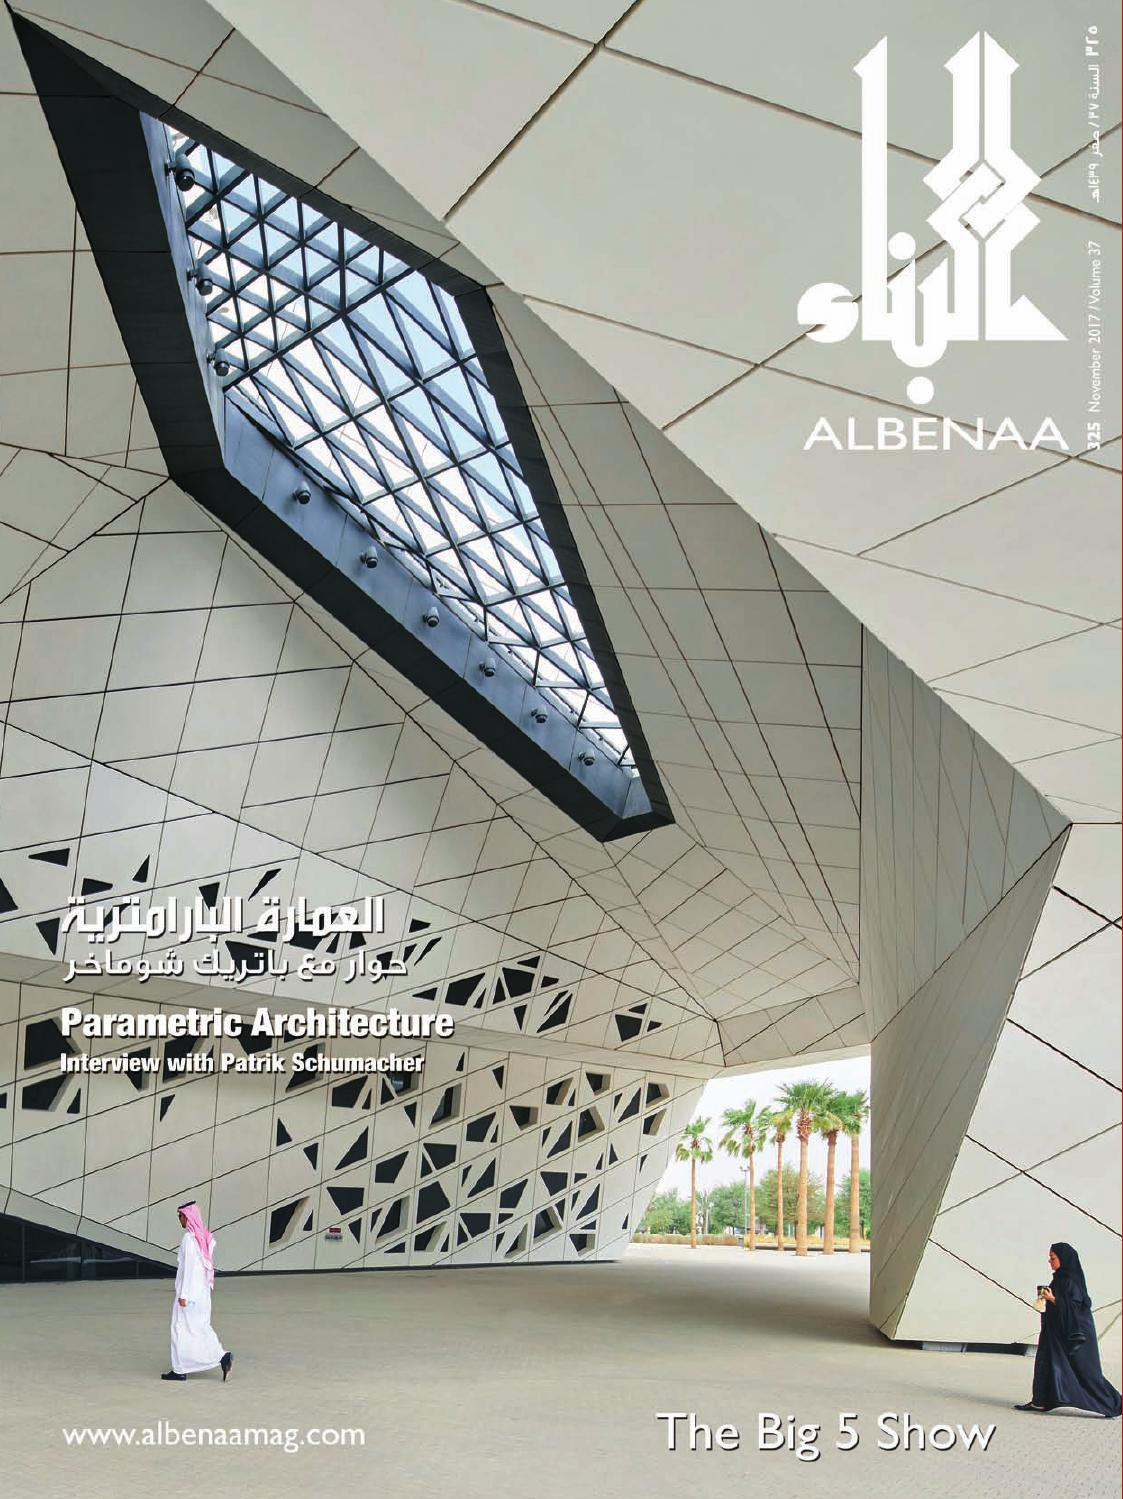 d0c53e5a5 Issue 325: العمارة البارامترية by مجلة البناء - issuu